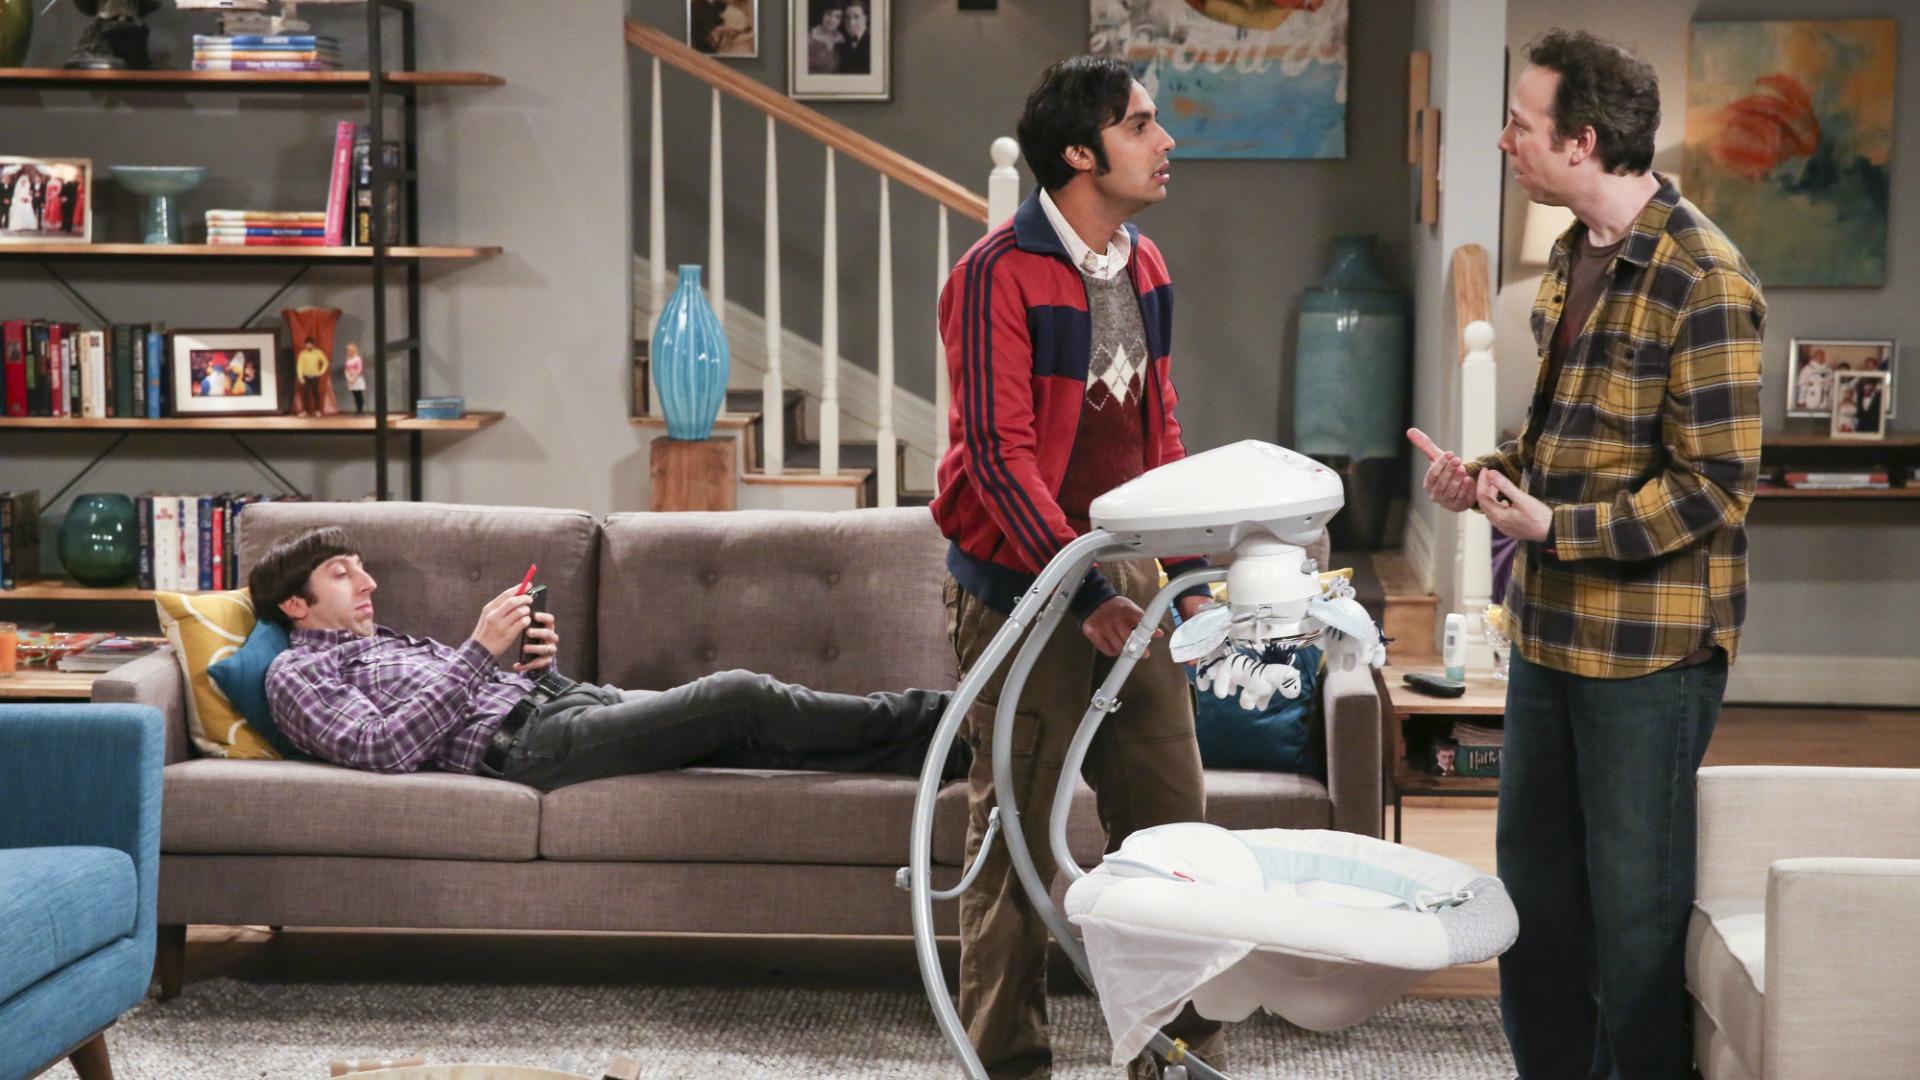 Howard kicks back as Raj and Stuart argue over baby-related responsibilities.